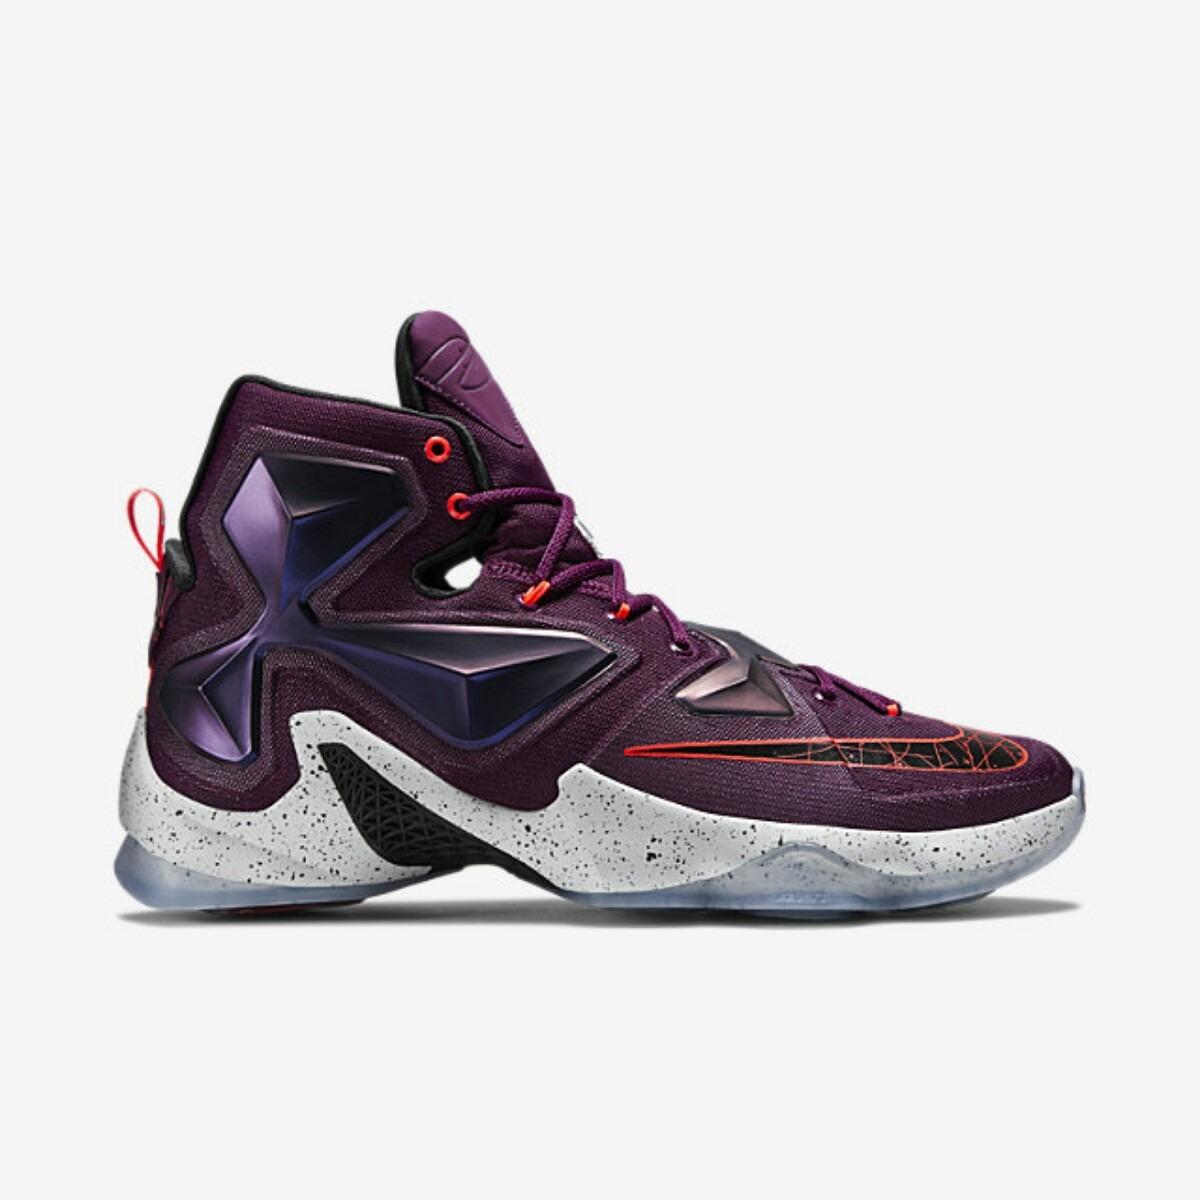 Lebron Iii Shoes For Sale